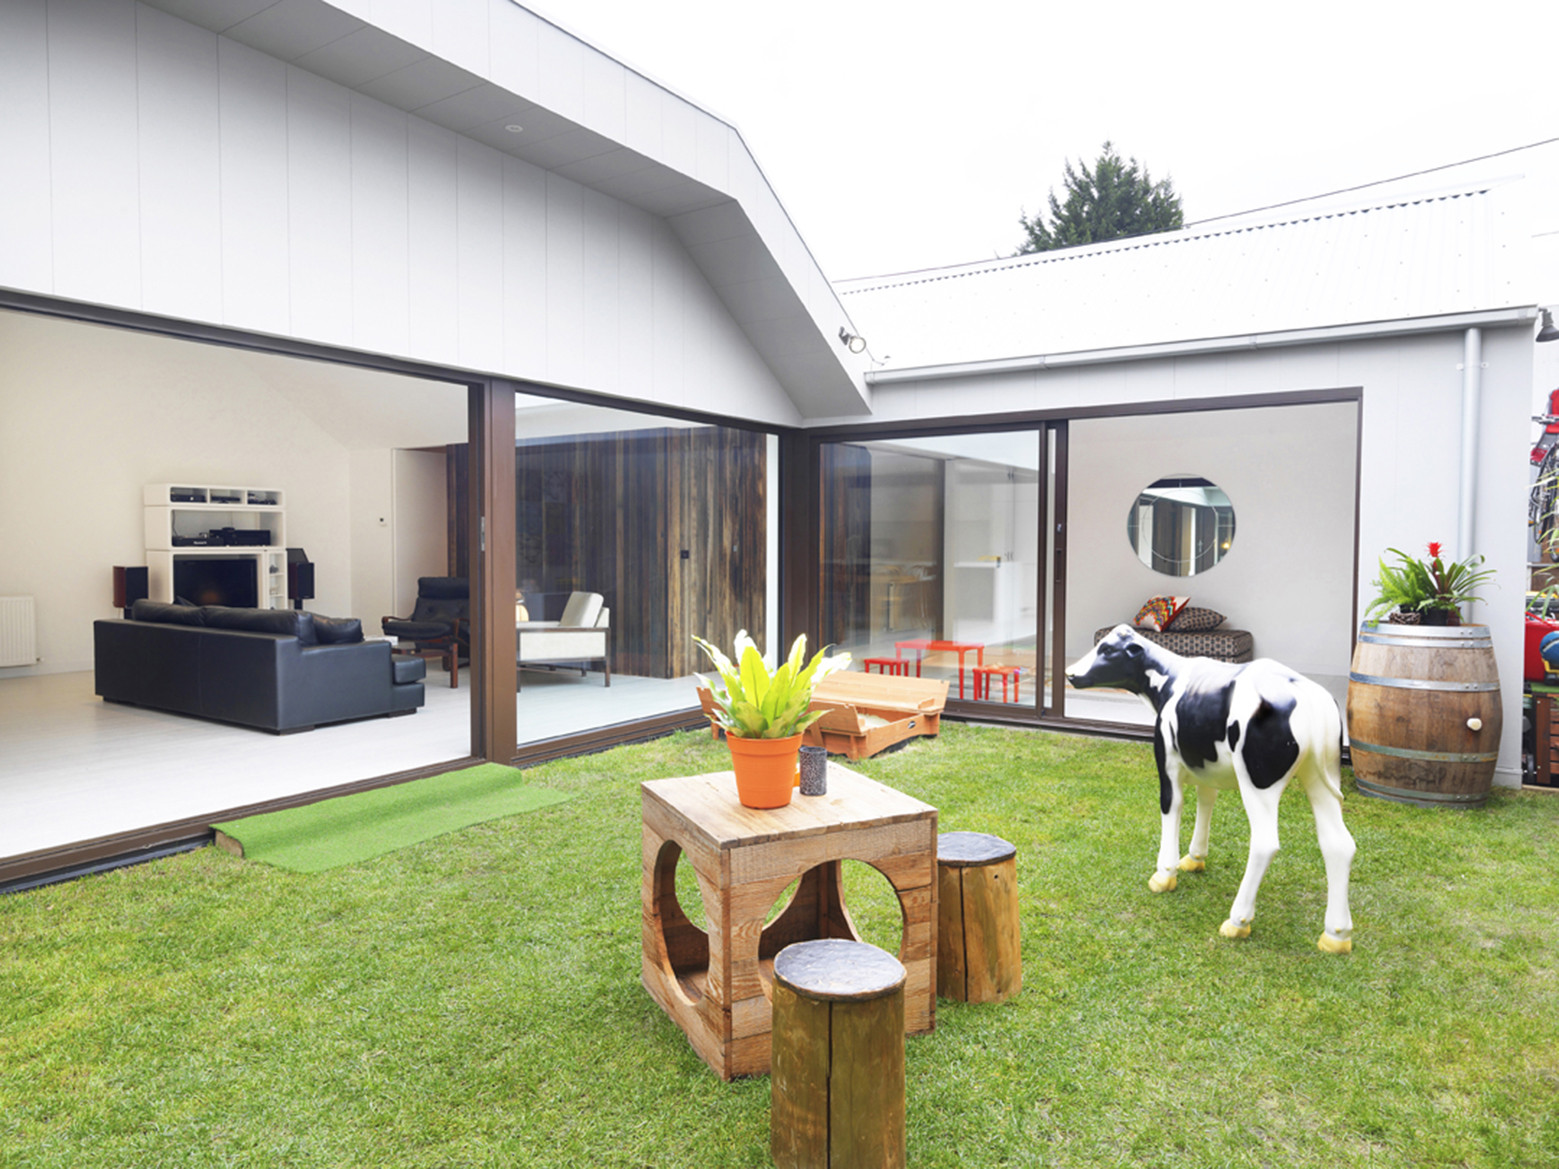 Casa en St Kilda / Jost Architects, © Andrew Wuttke & Project Client